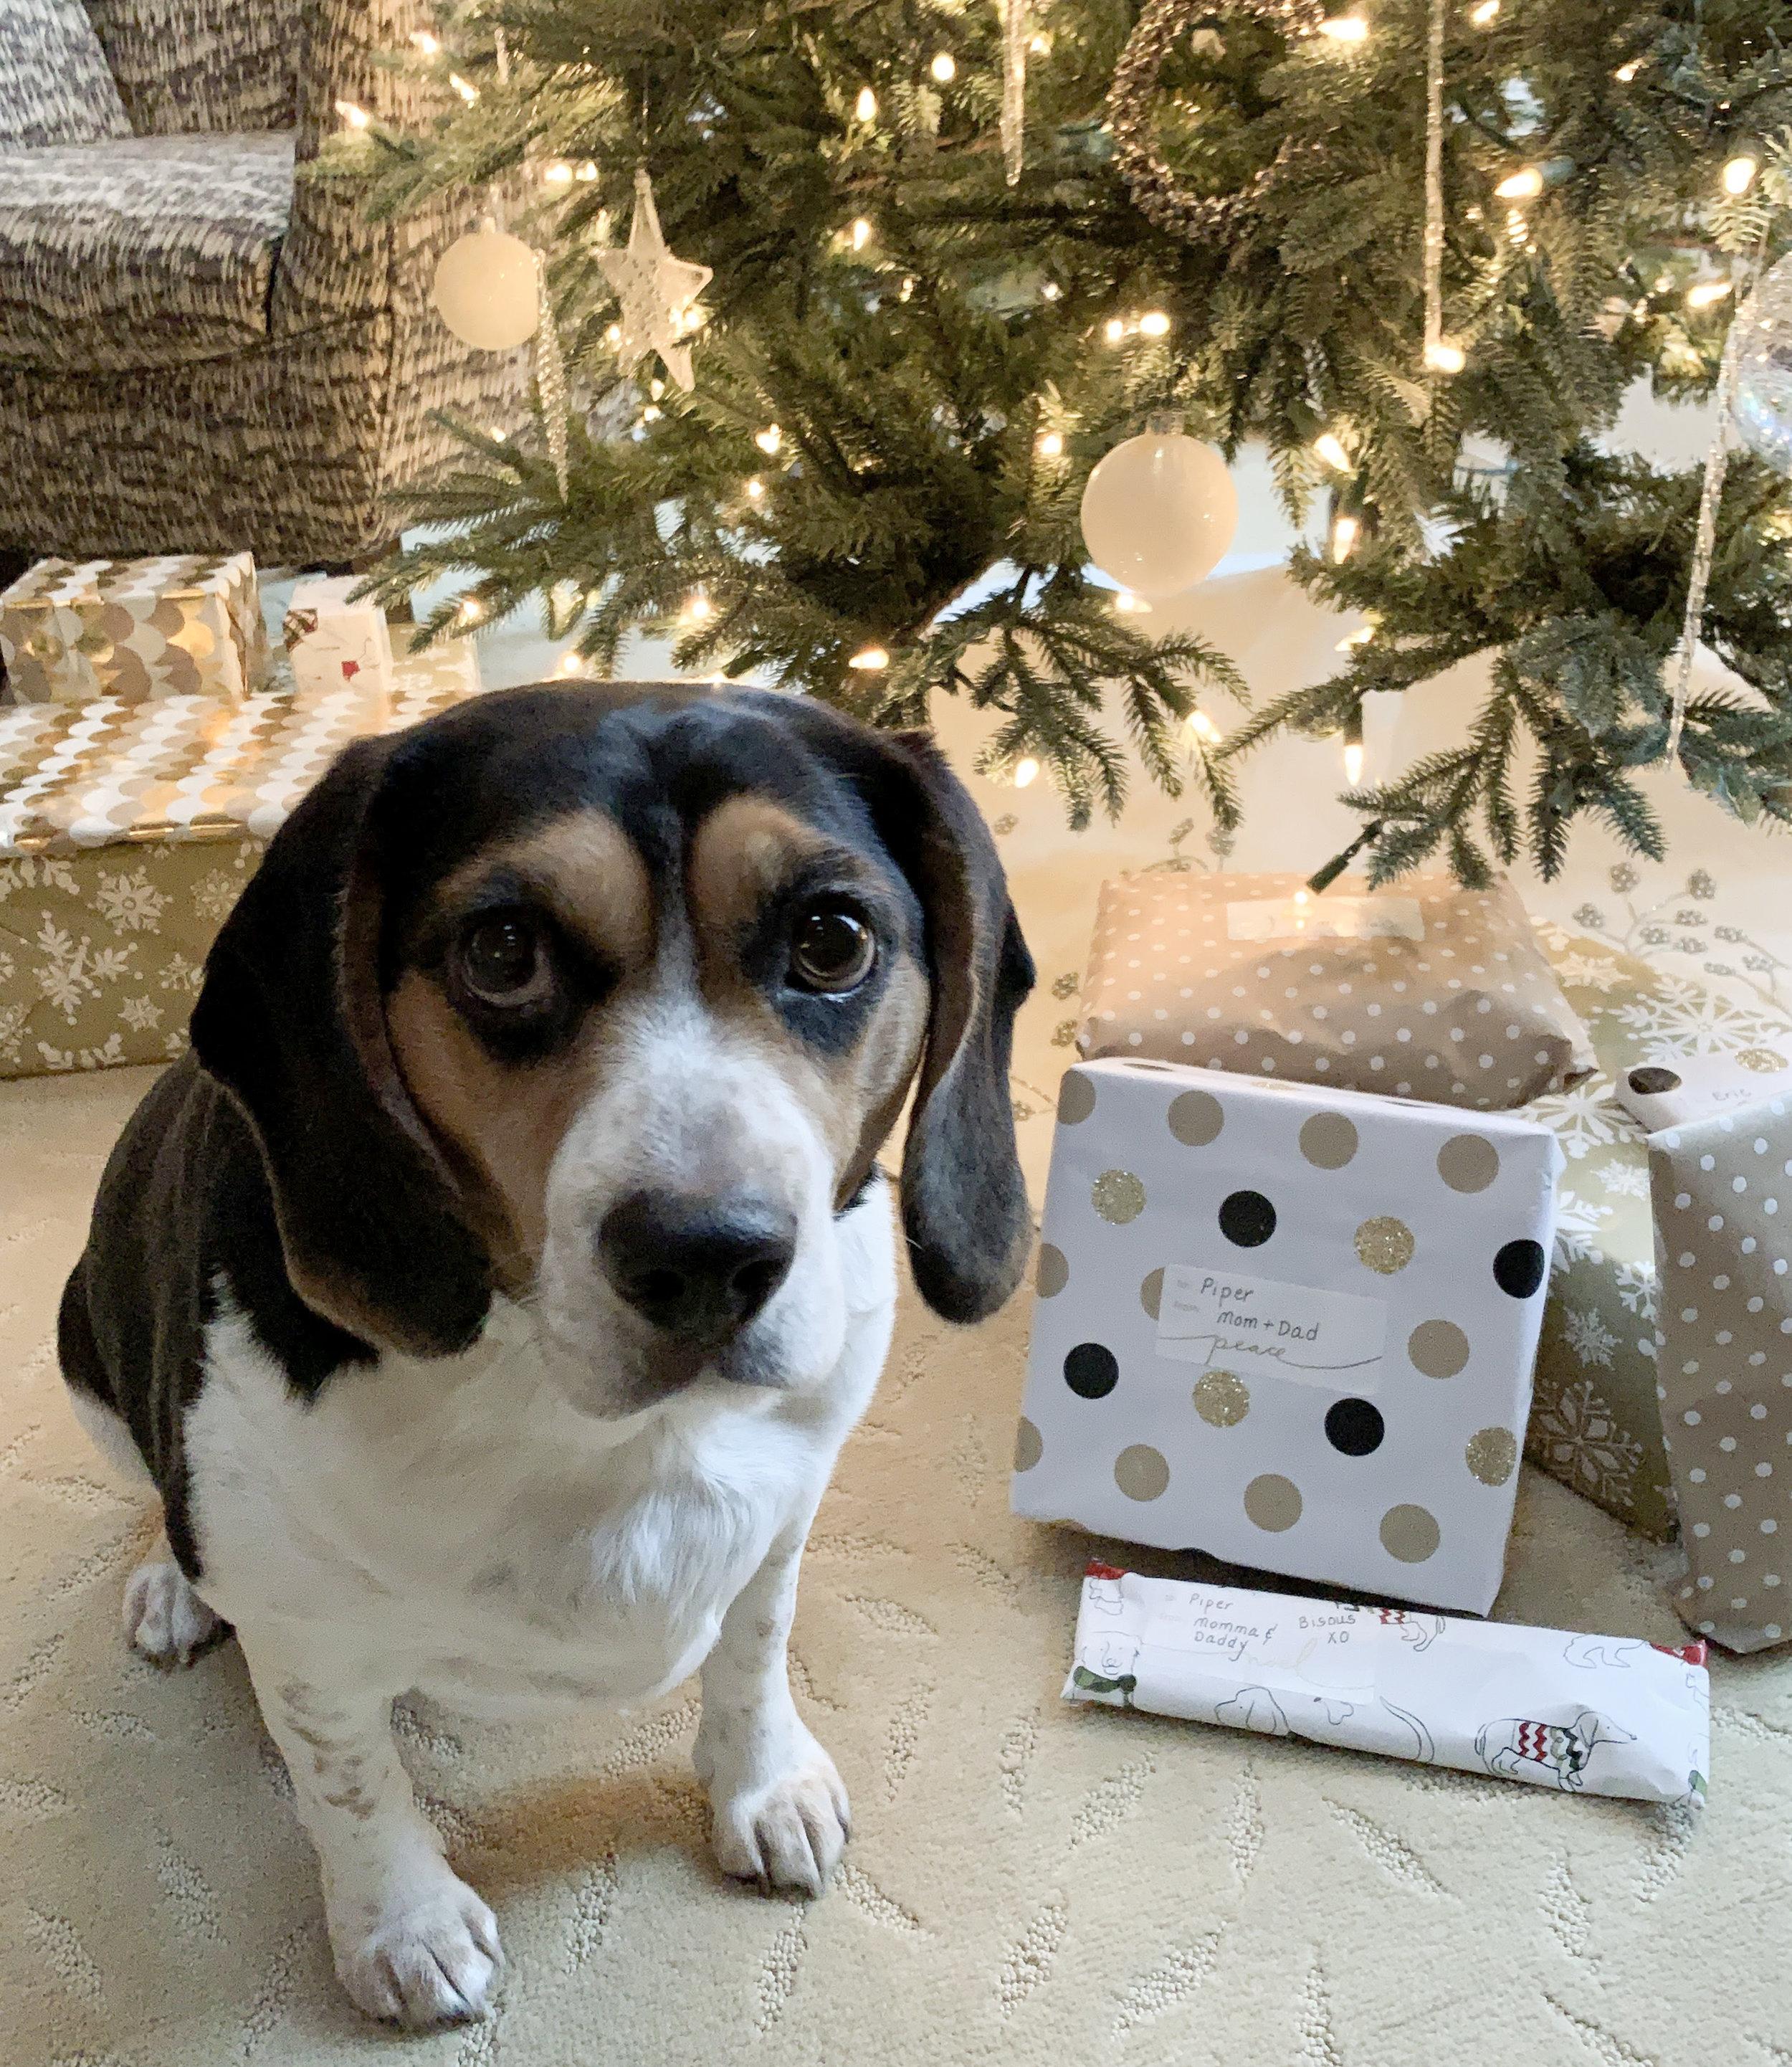 Piper - Christmas 2018